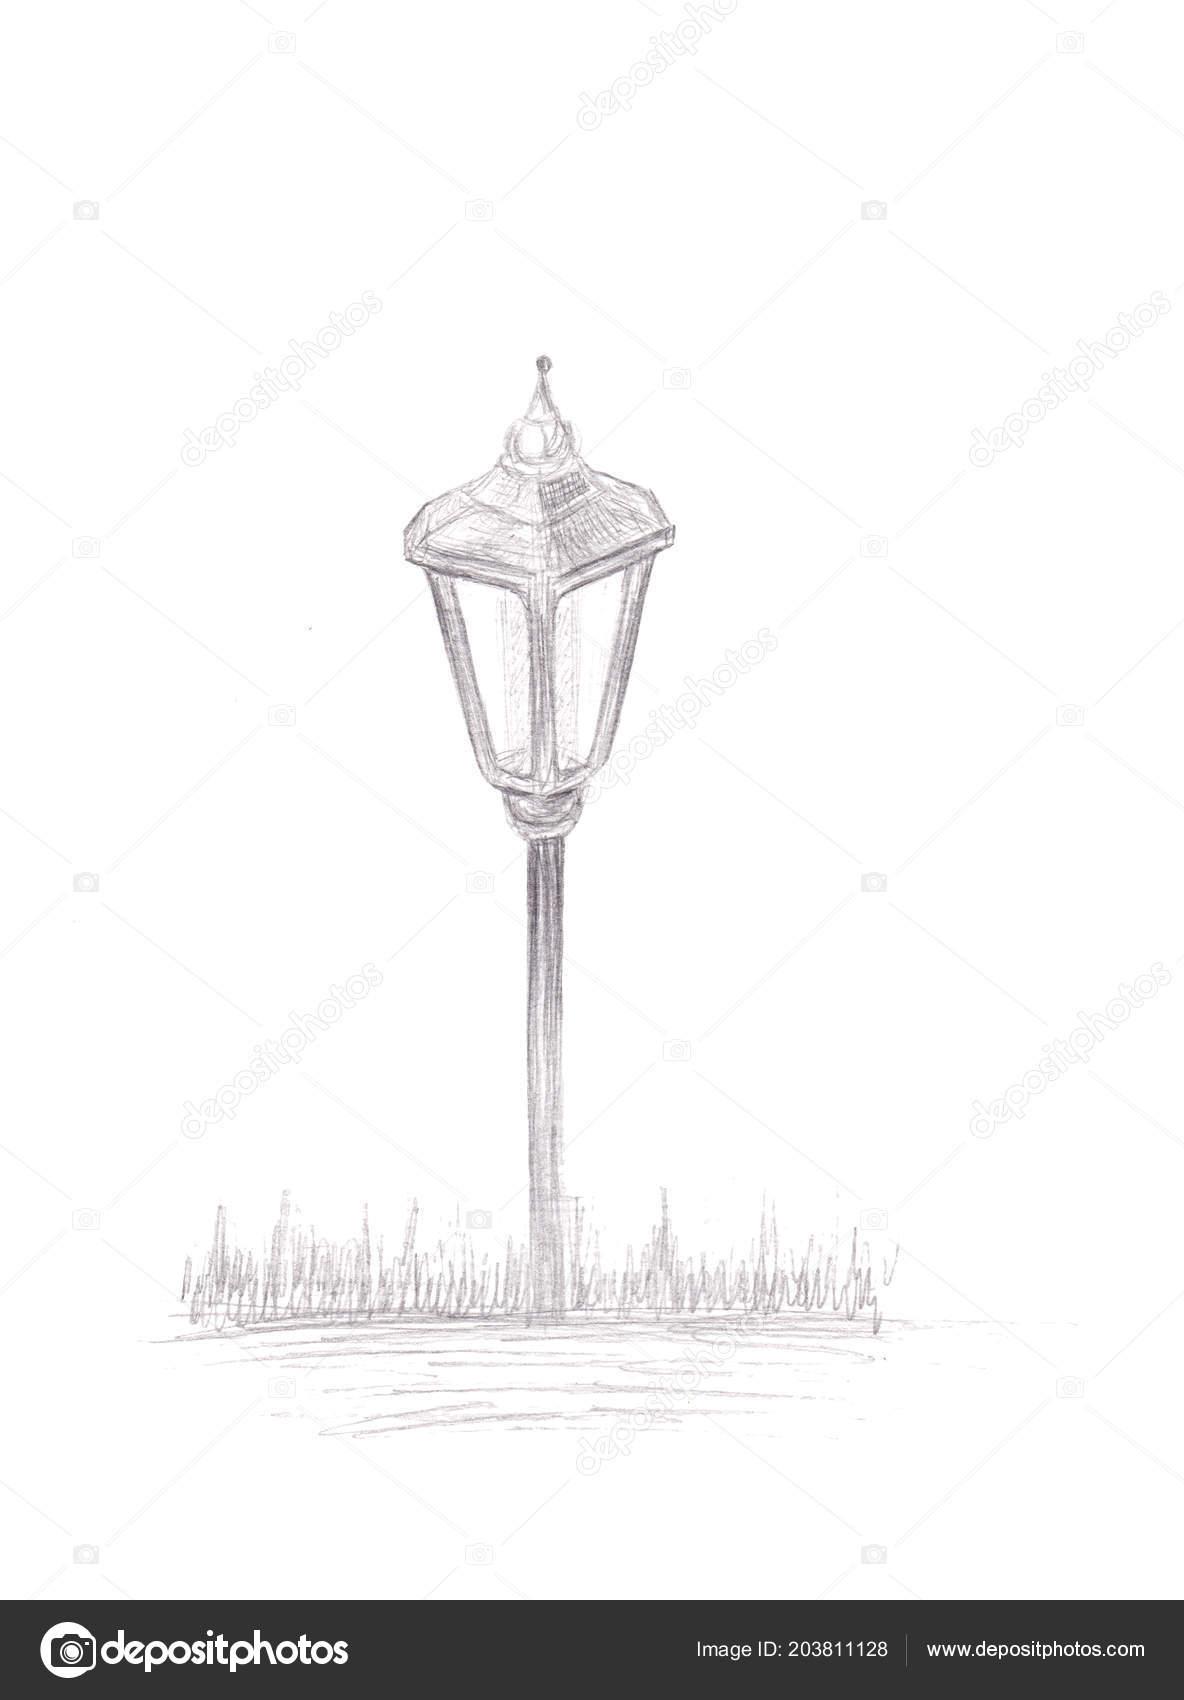 Small garden light solar powered lamp drawing pencil sketch lantern stock photo